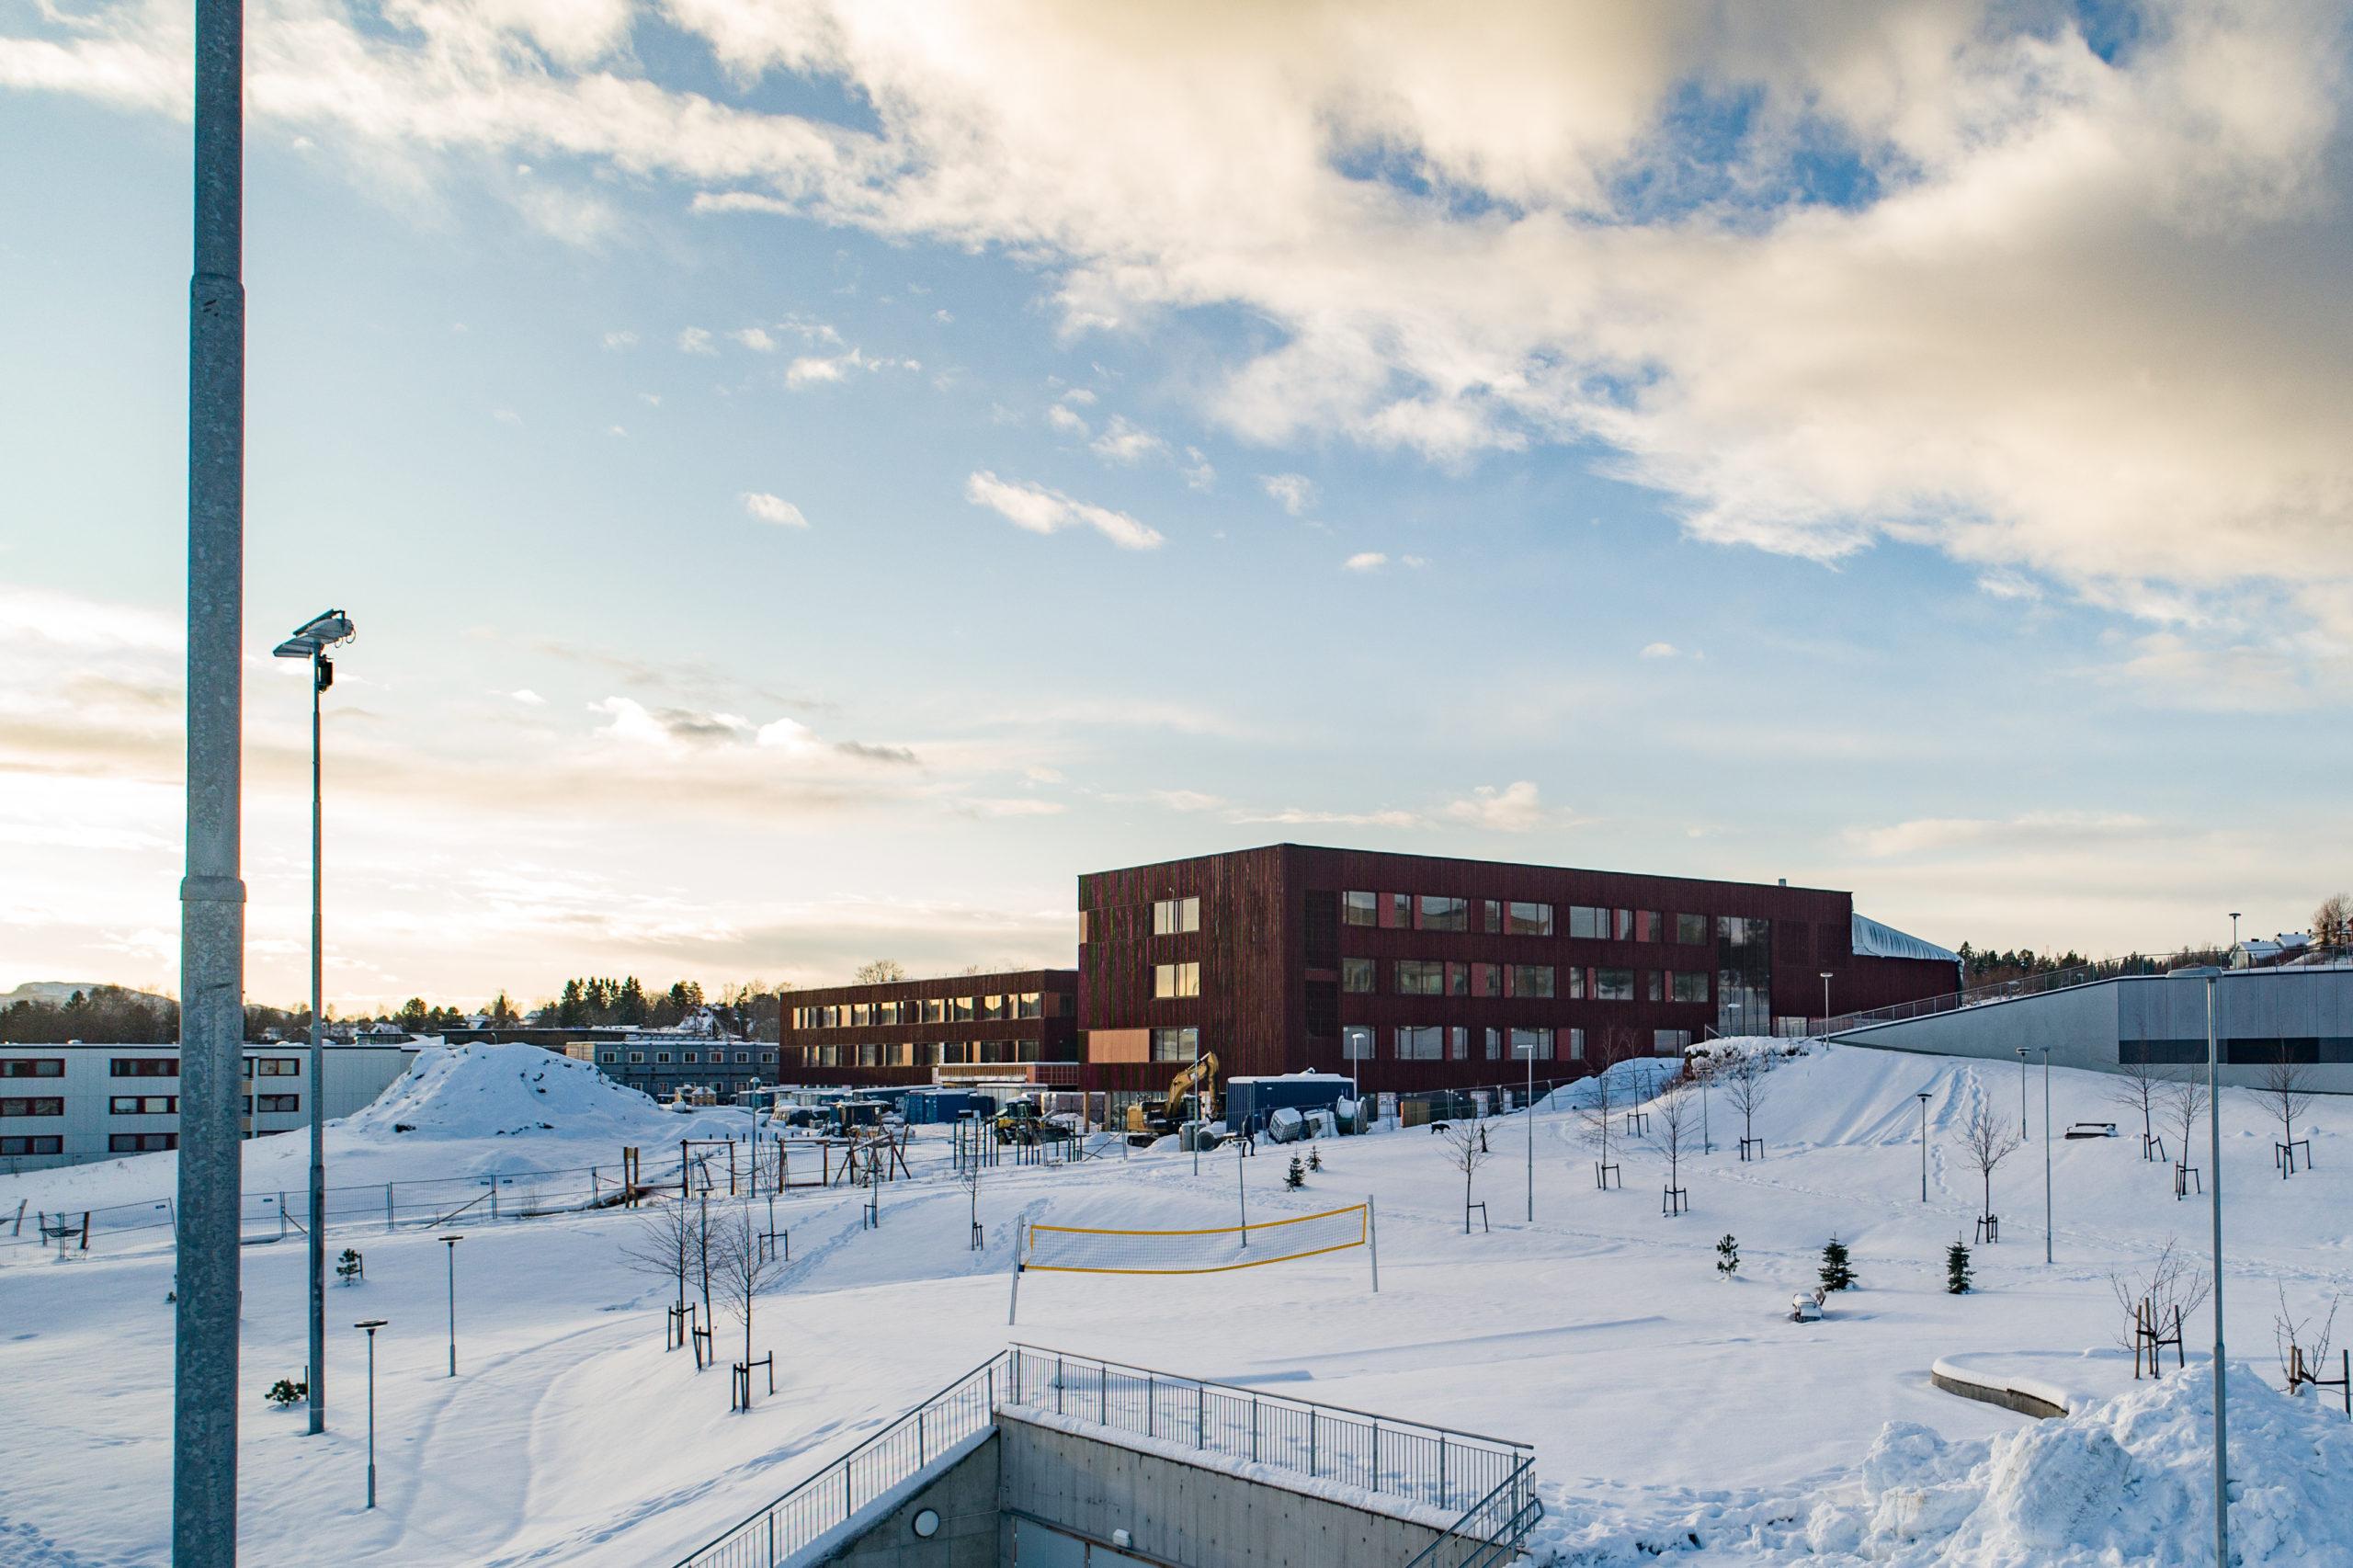 Nytt skolebygg i snødekt landskap